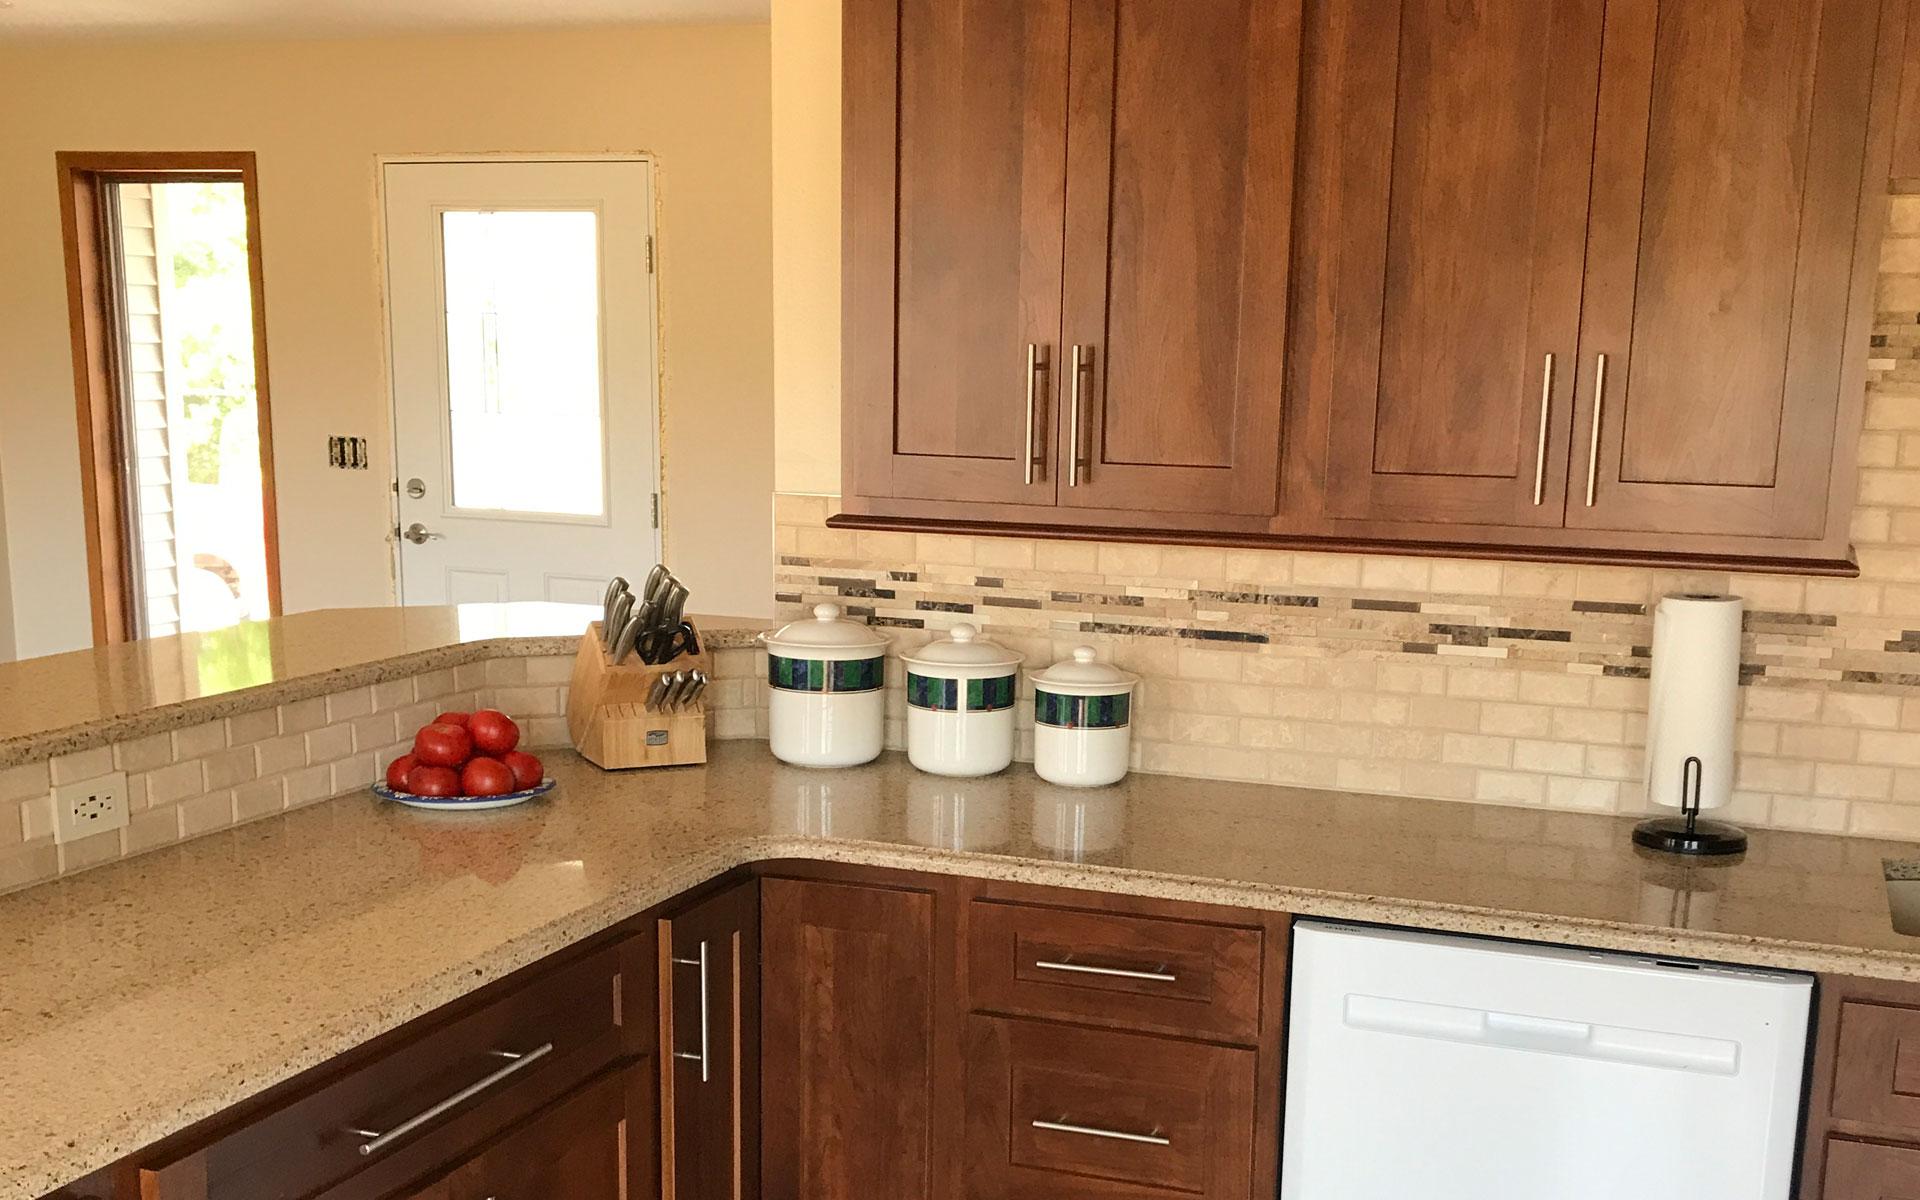 KitchenCabinets-NewHome.jpg